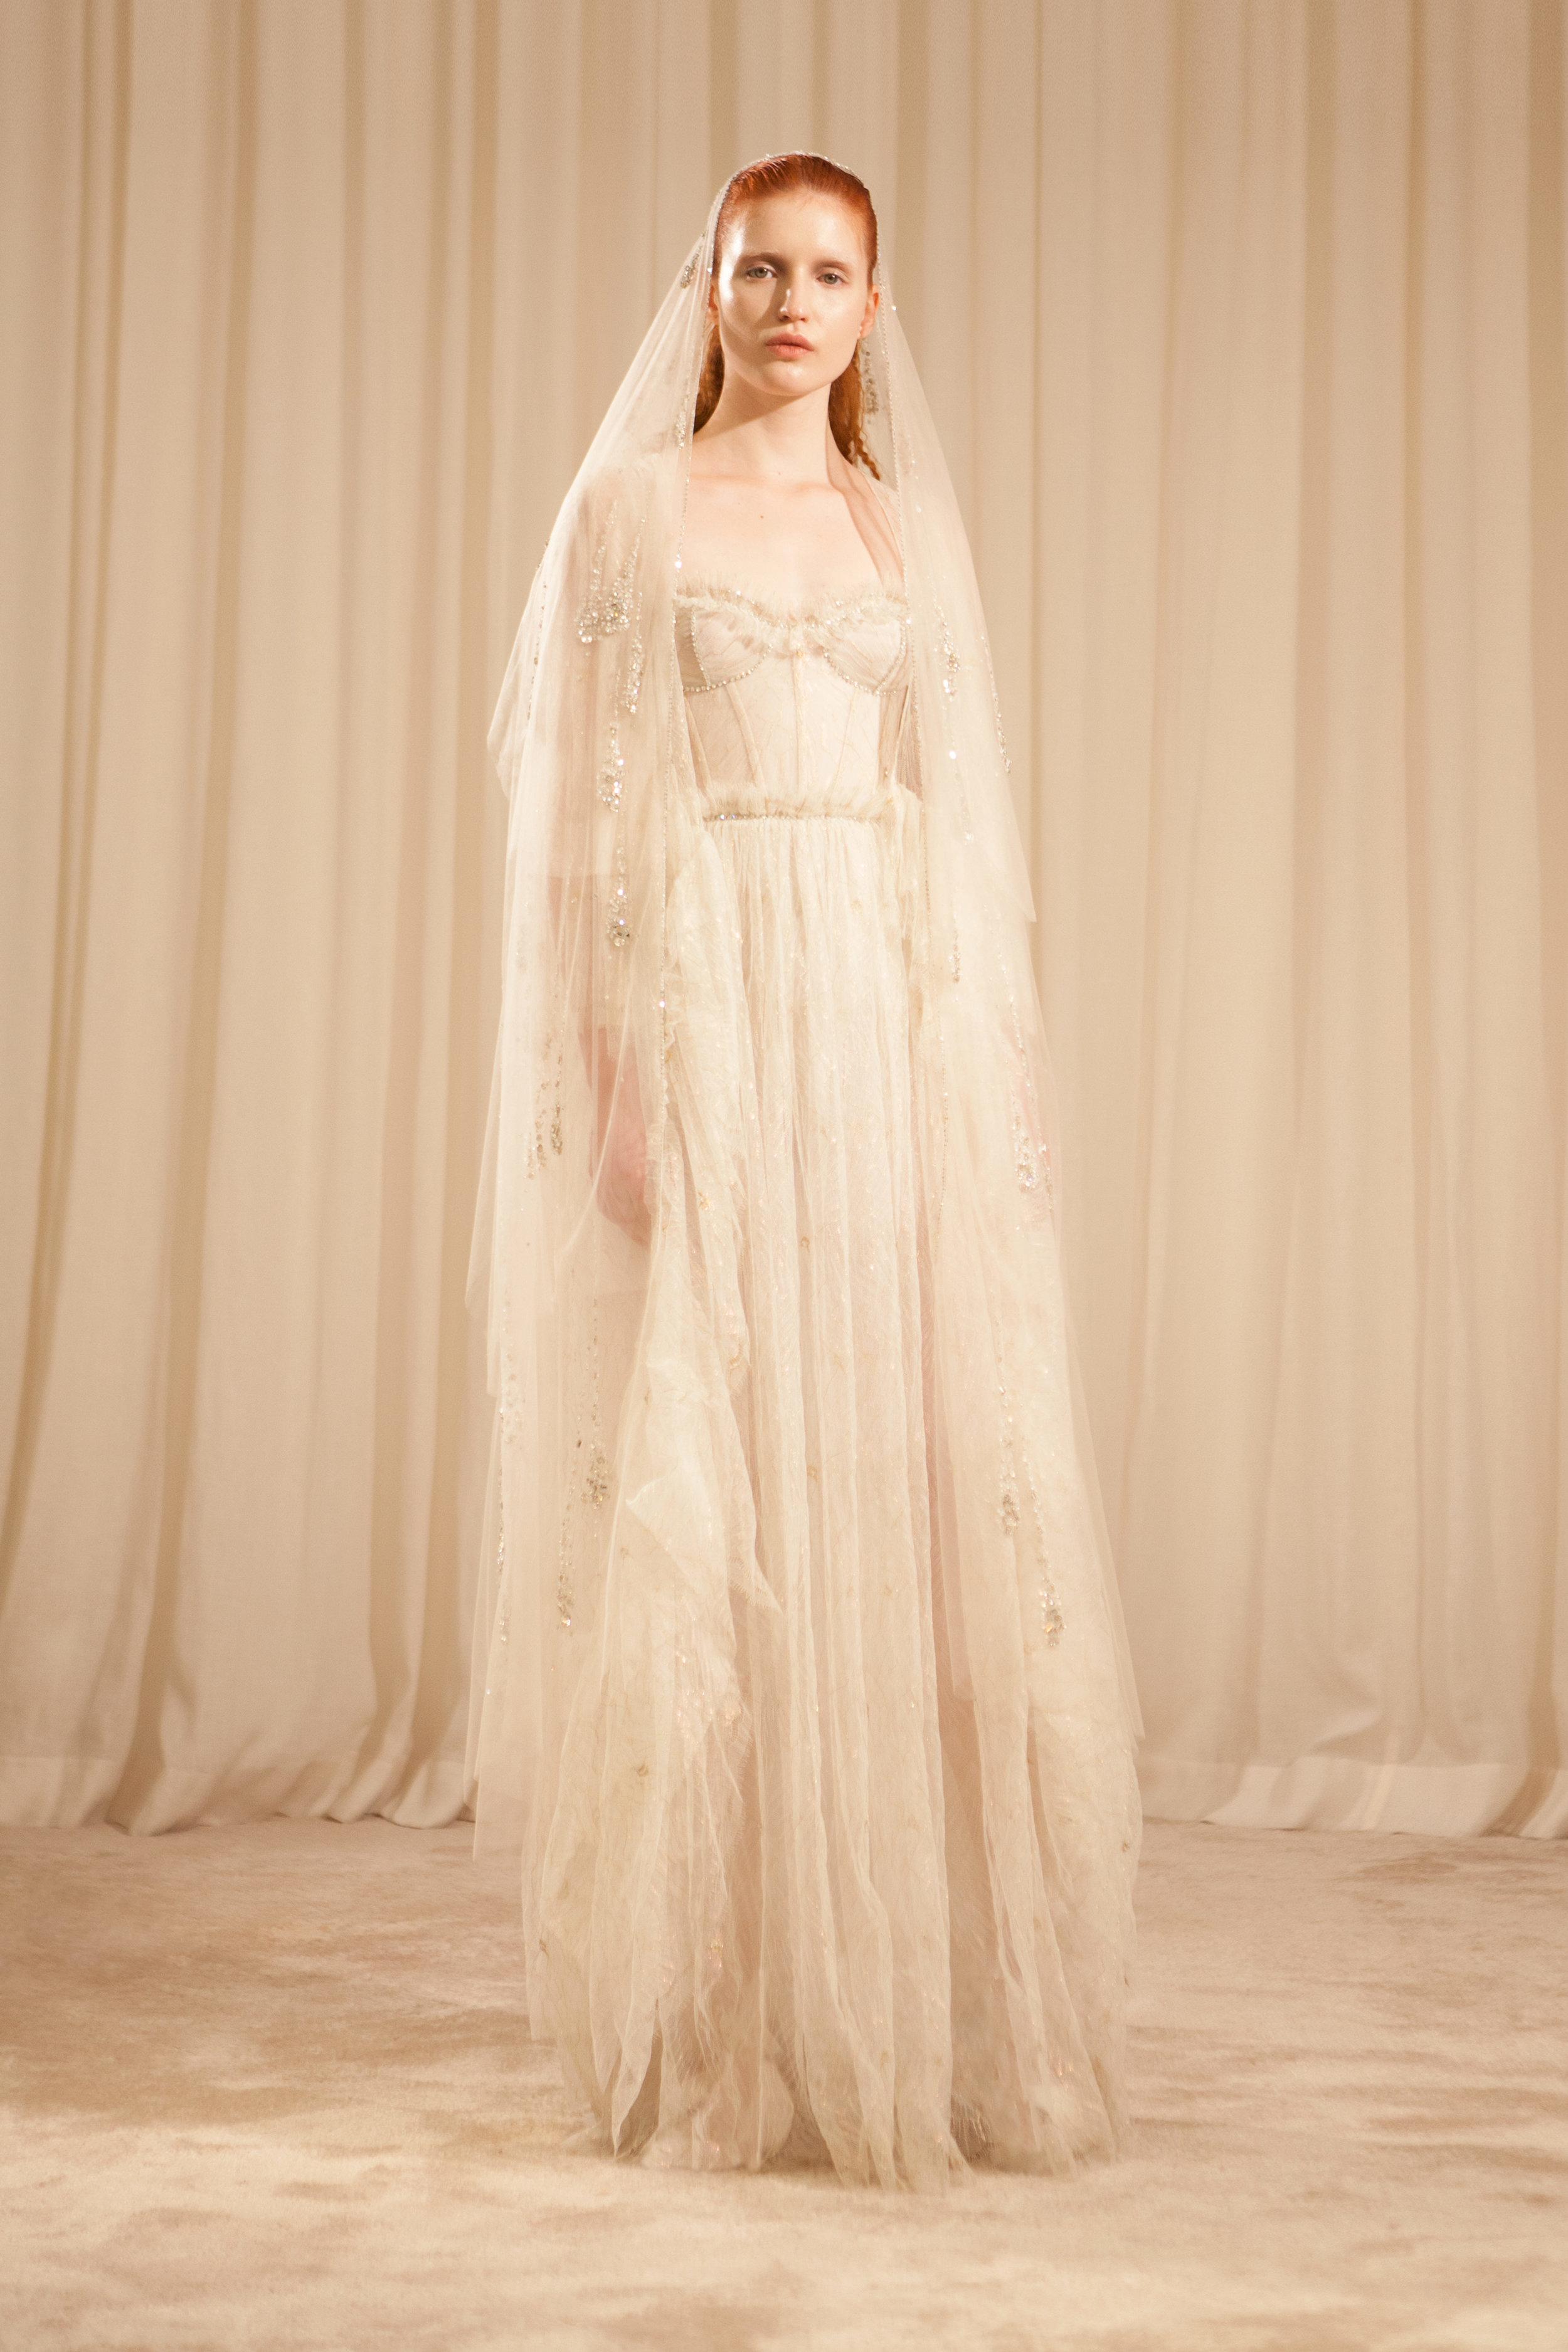 SandraMansour-S1-Lookbook-Bridal-10.jpg